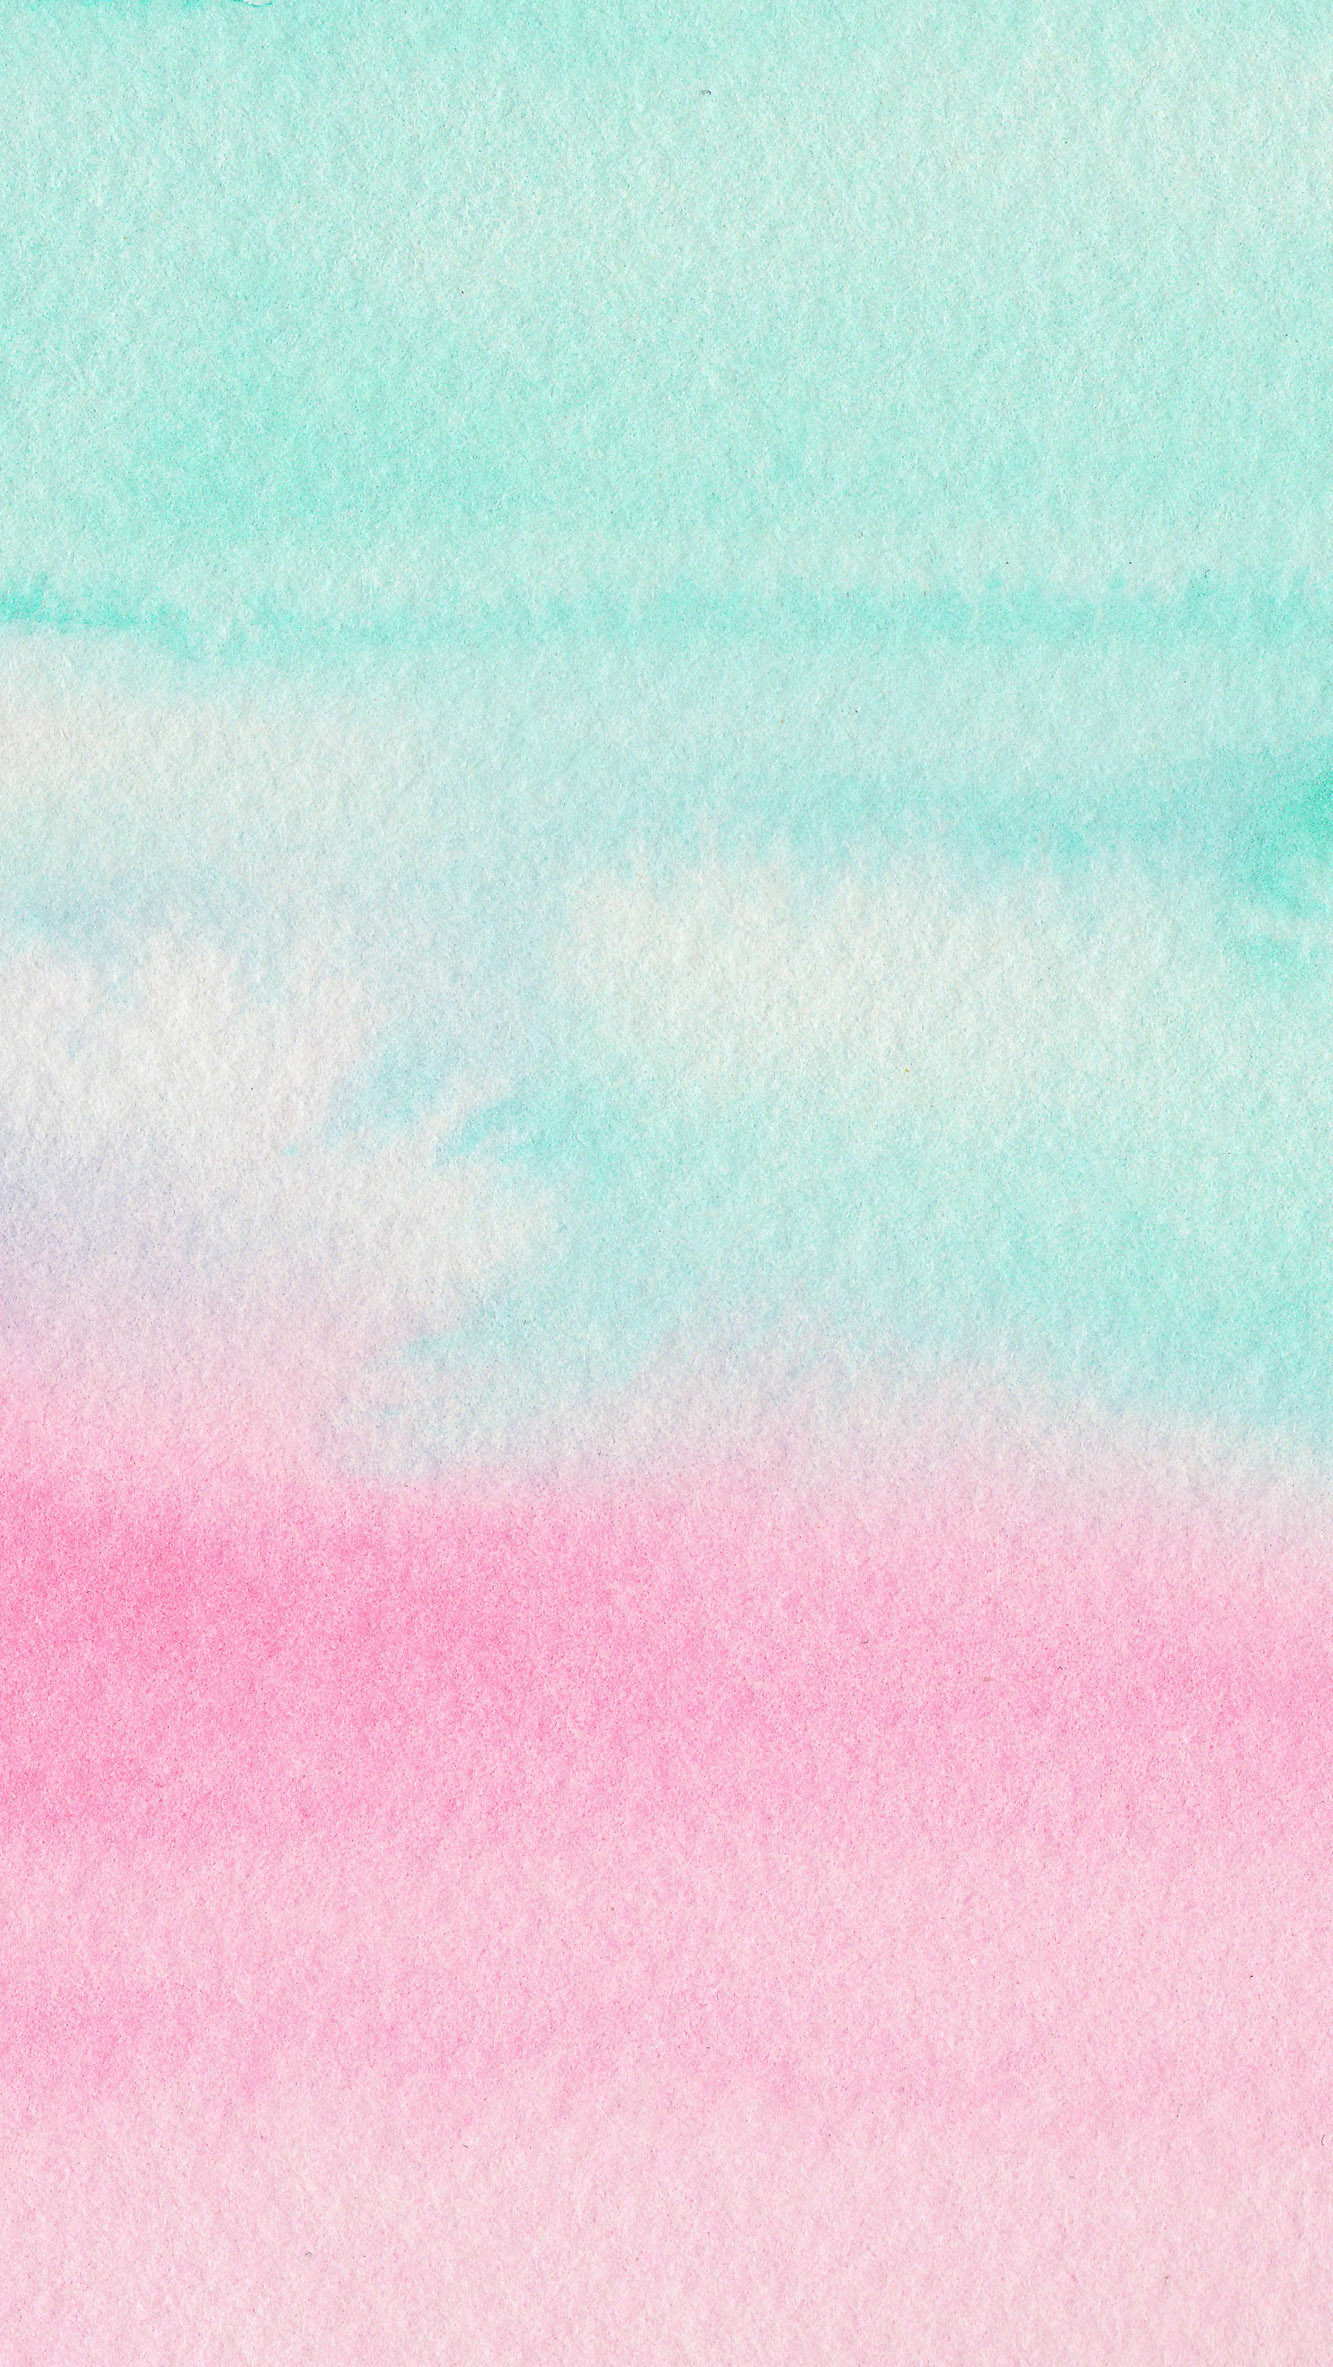 Akame Ga Kill Akame Cute Wallpaper Soft Pink Wallpaper 183 ① Wallpapertag